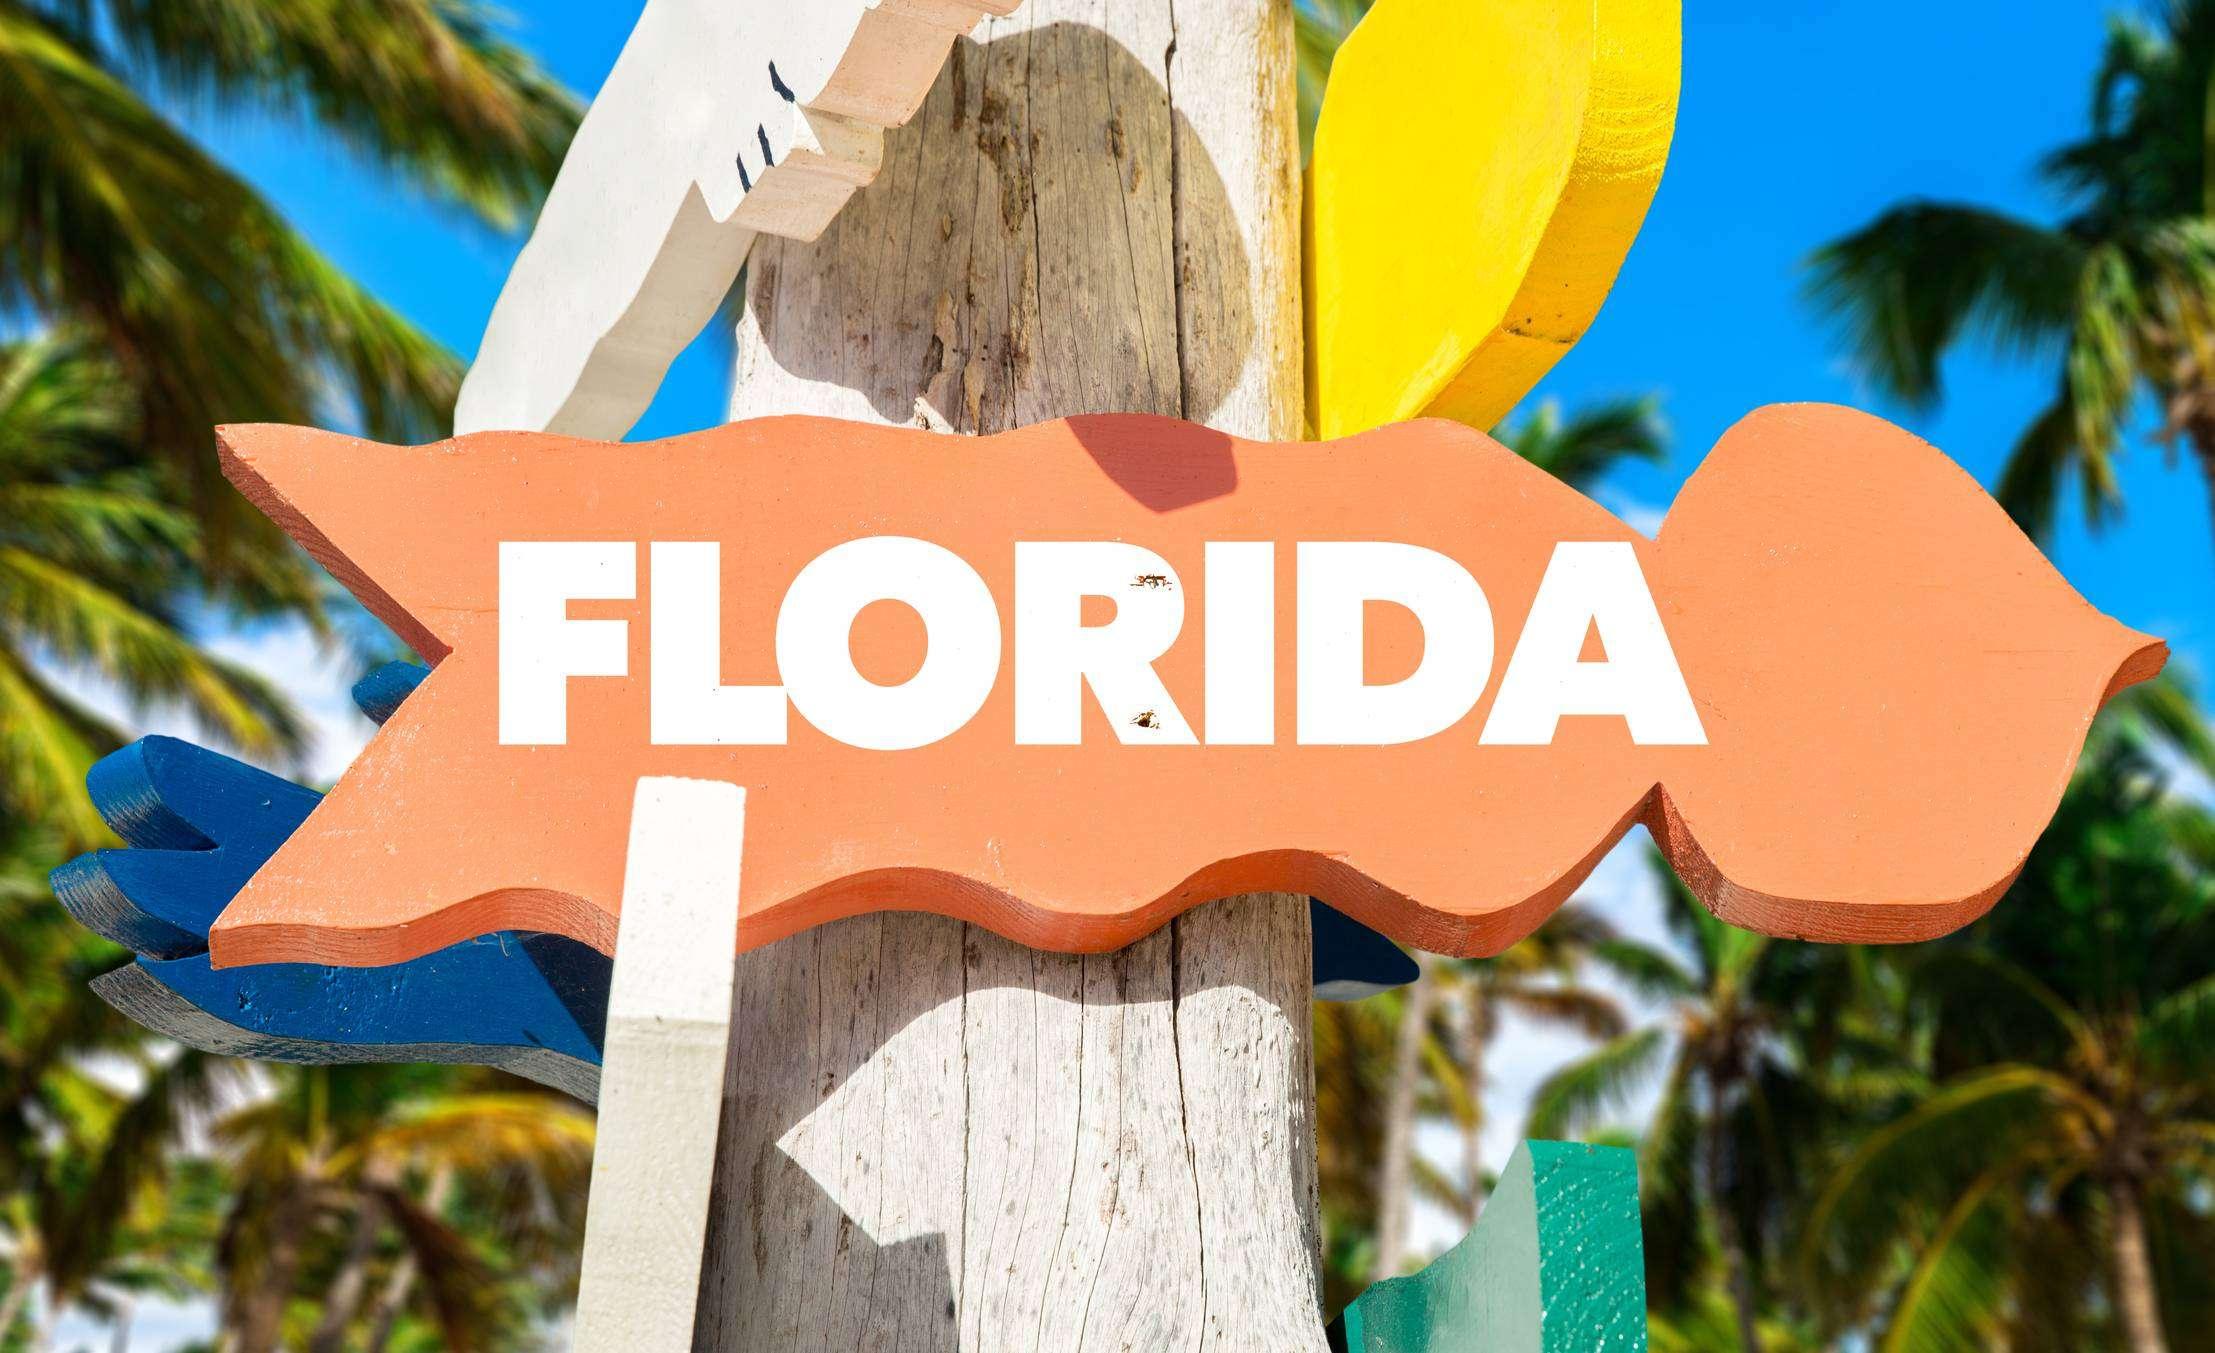 Será que vale a pena morar na Flórida?